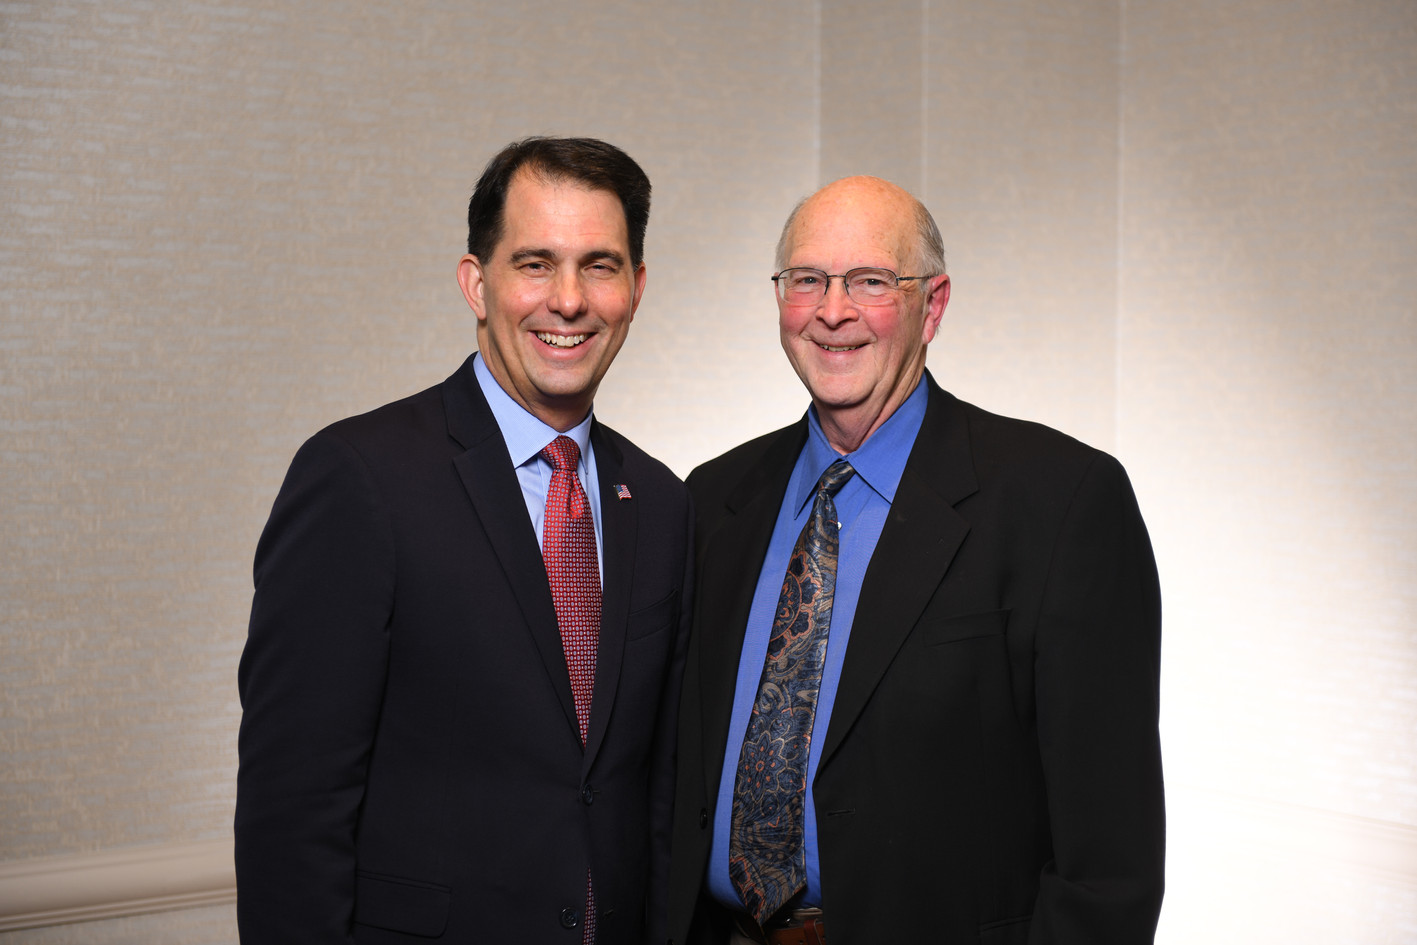 Scott Walker and friend